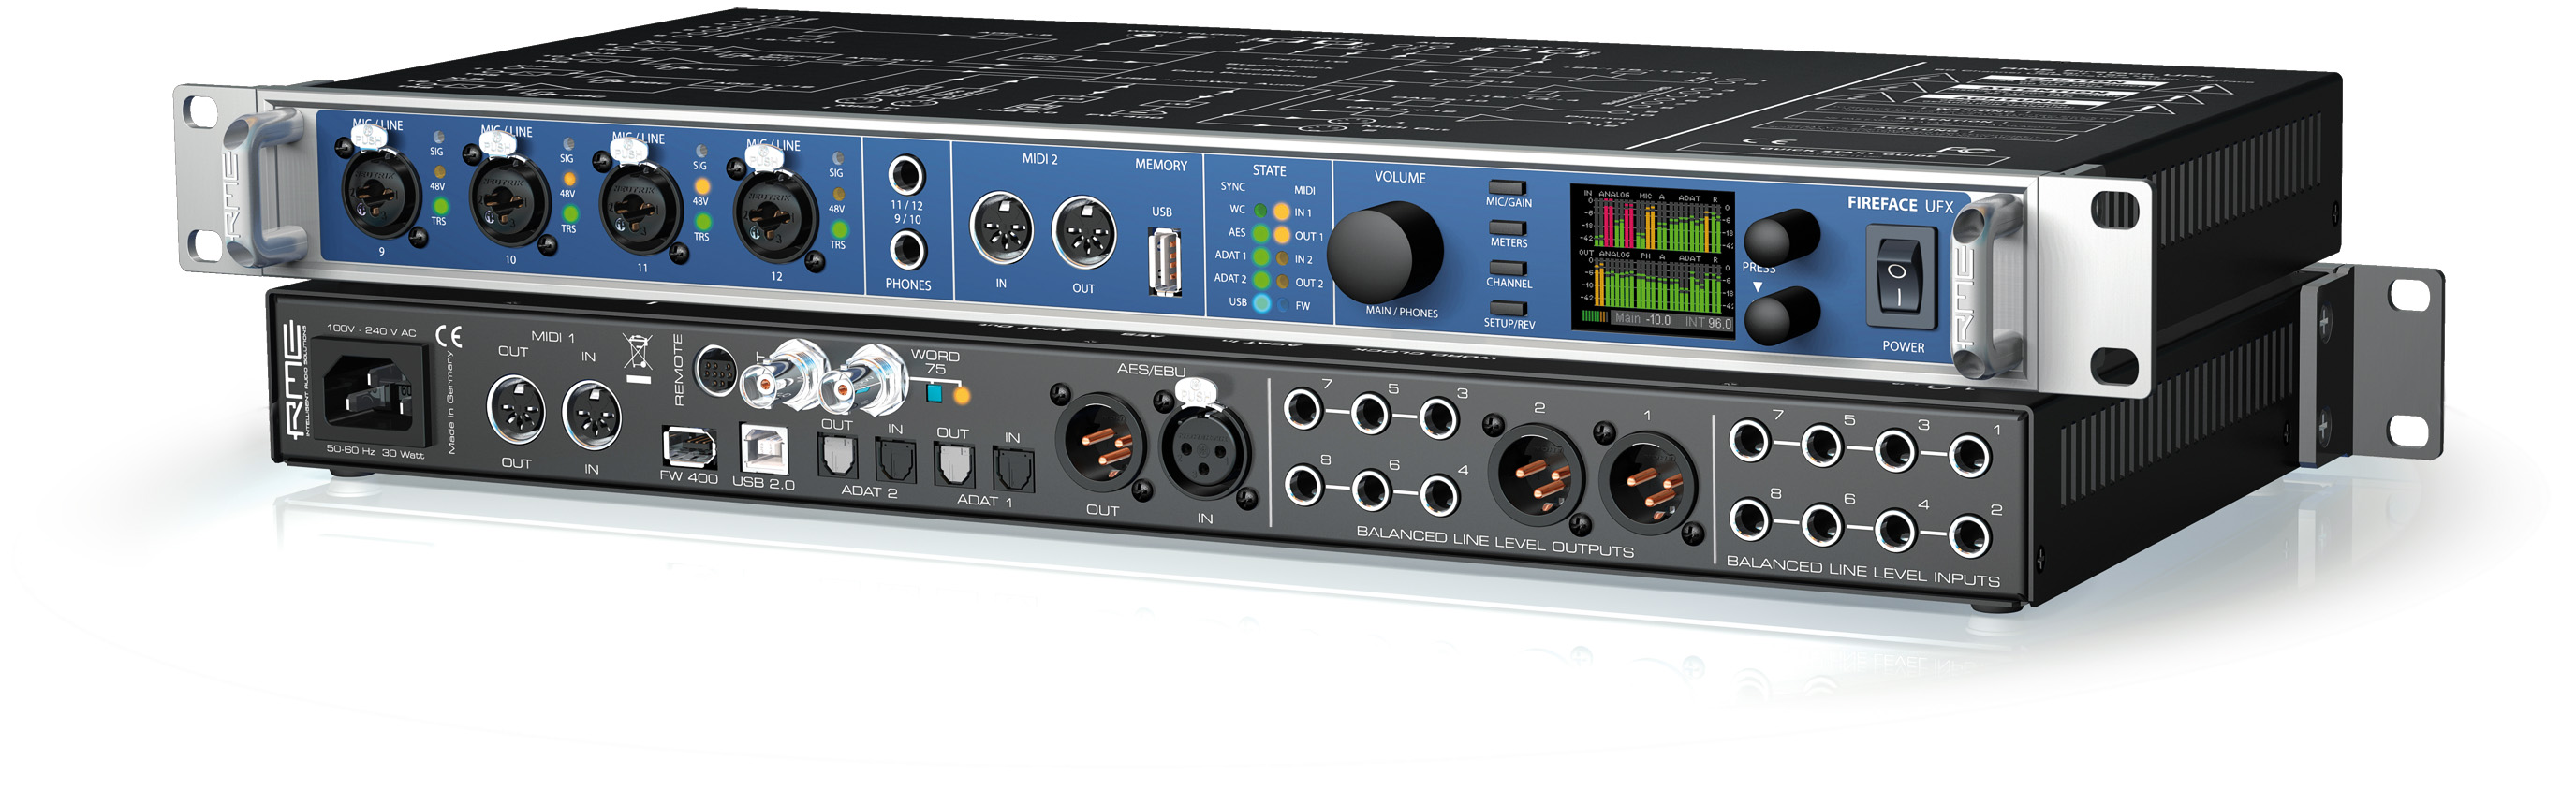 AuSIM eCommerce - RME Digital Audio Interfaces